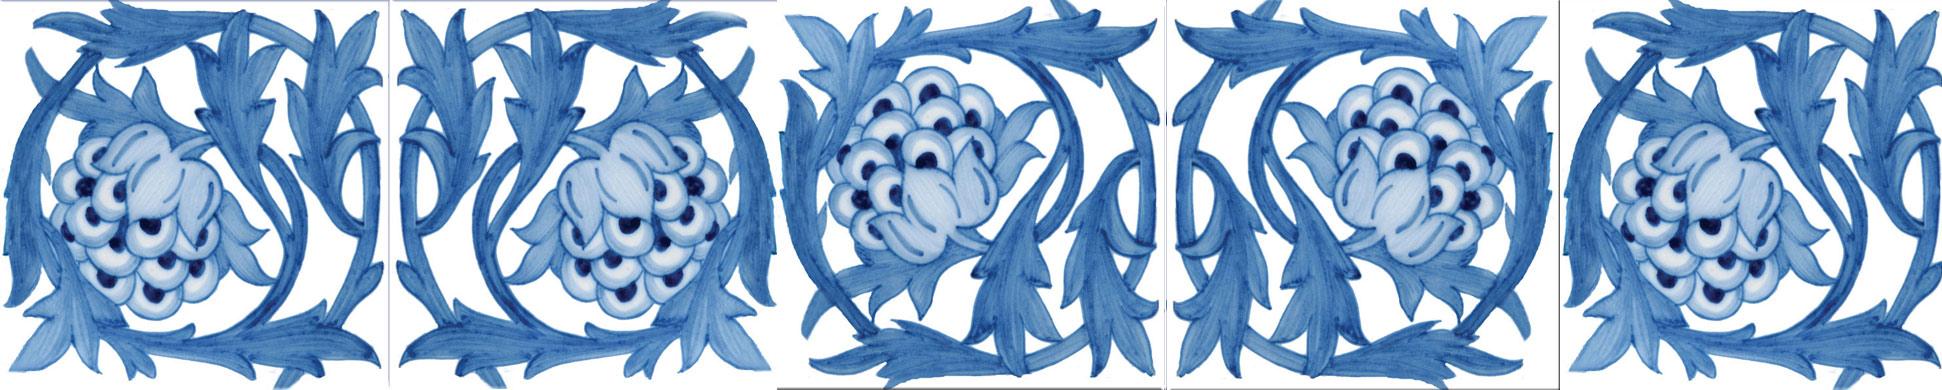 William Morris and William De Morgan artichoke tiles